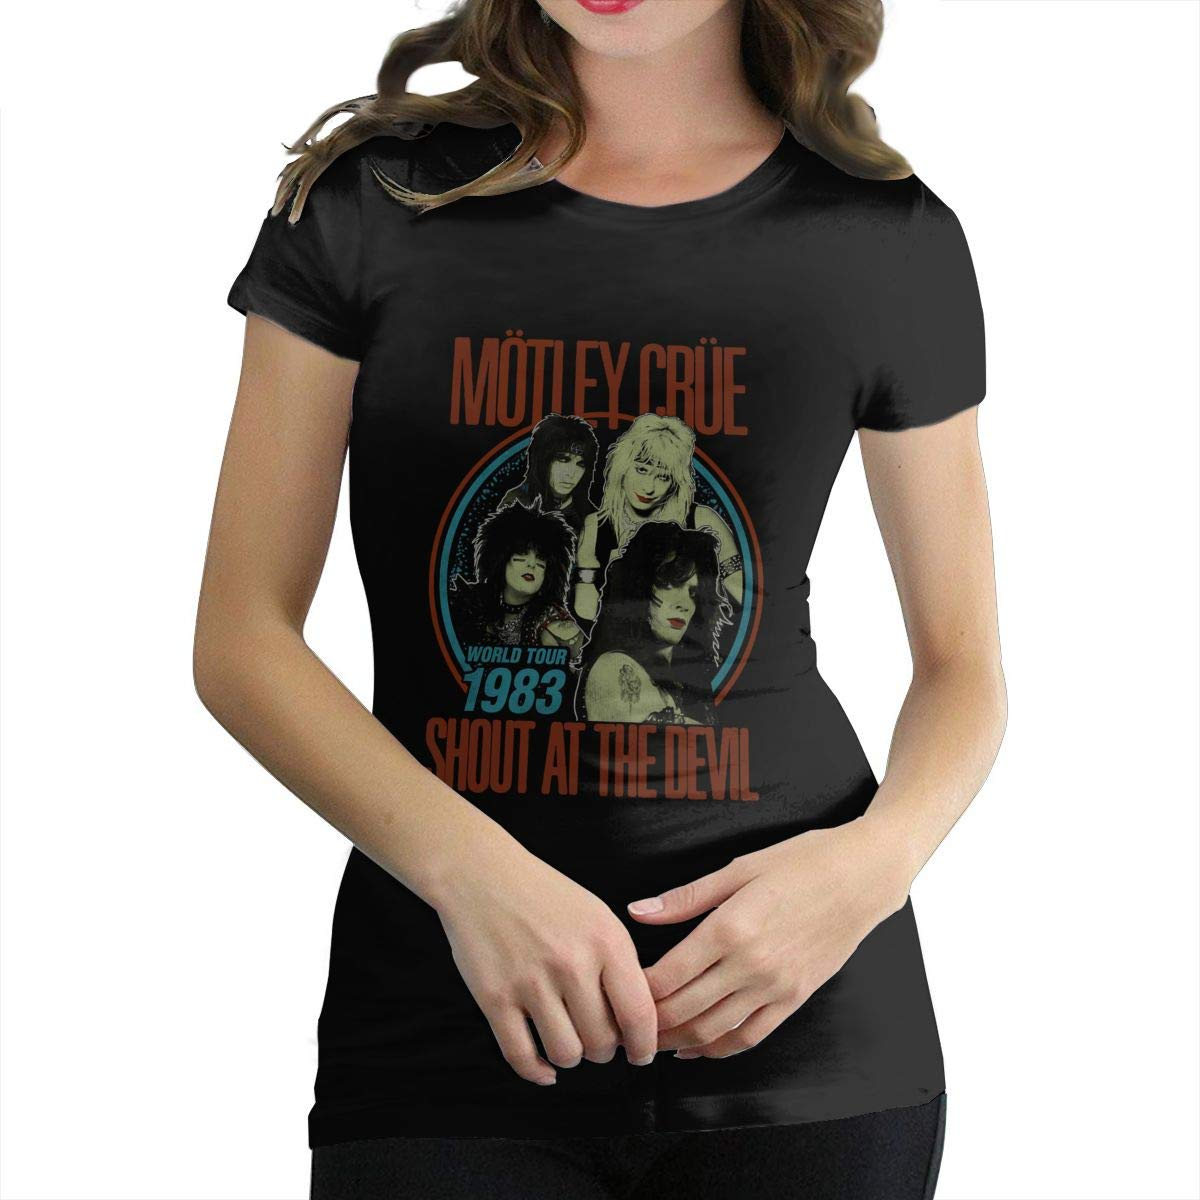 Ocilgc Motley Crue Shirt Round Neck Short Sleeve Tee For S